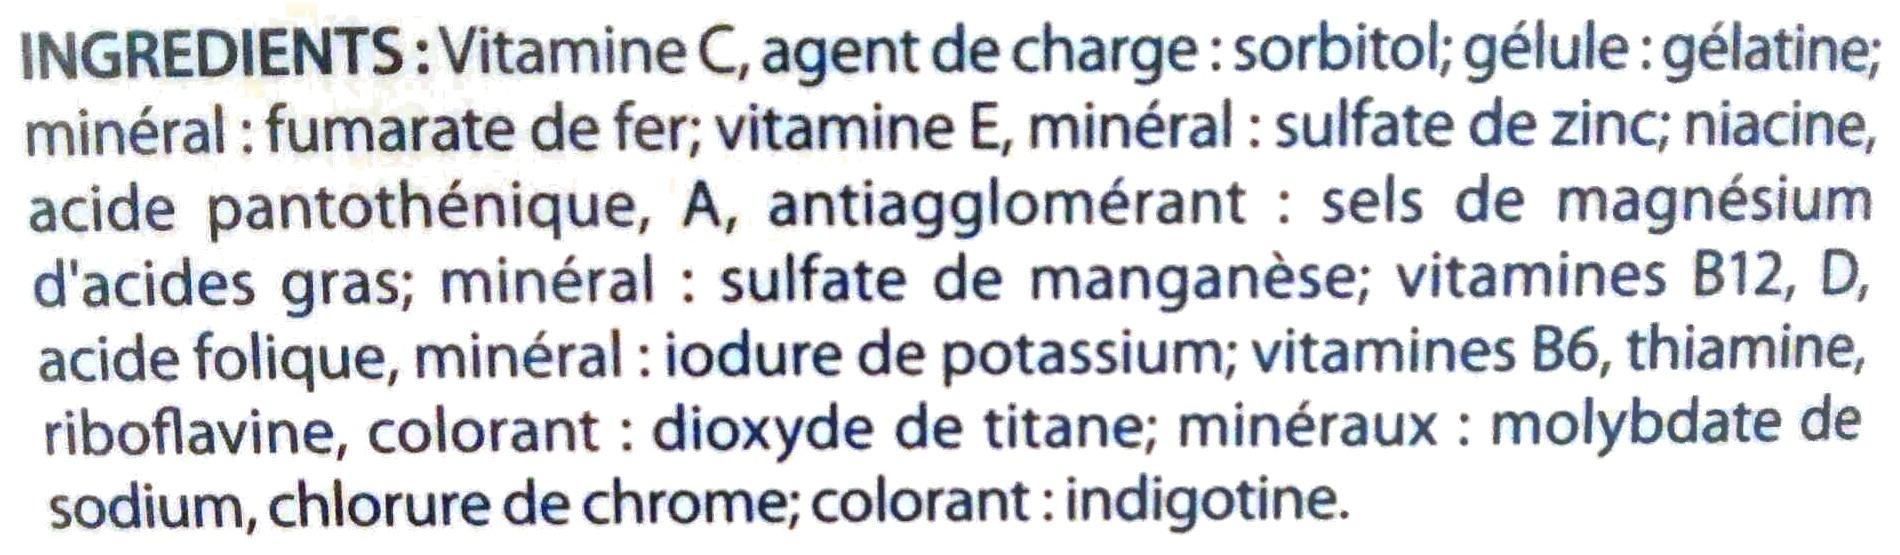 Multivitamines 1 par jour - Ingredients